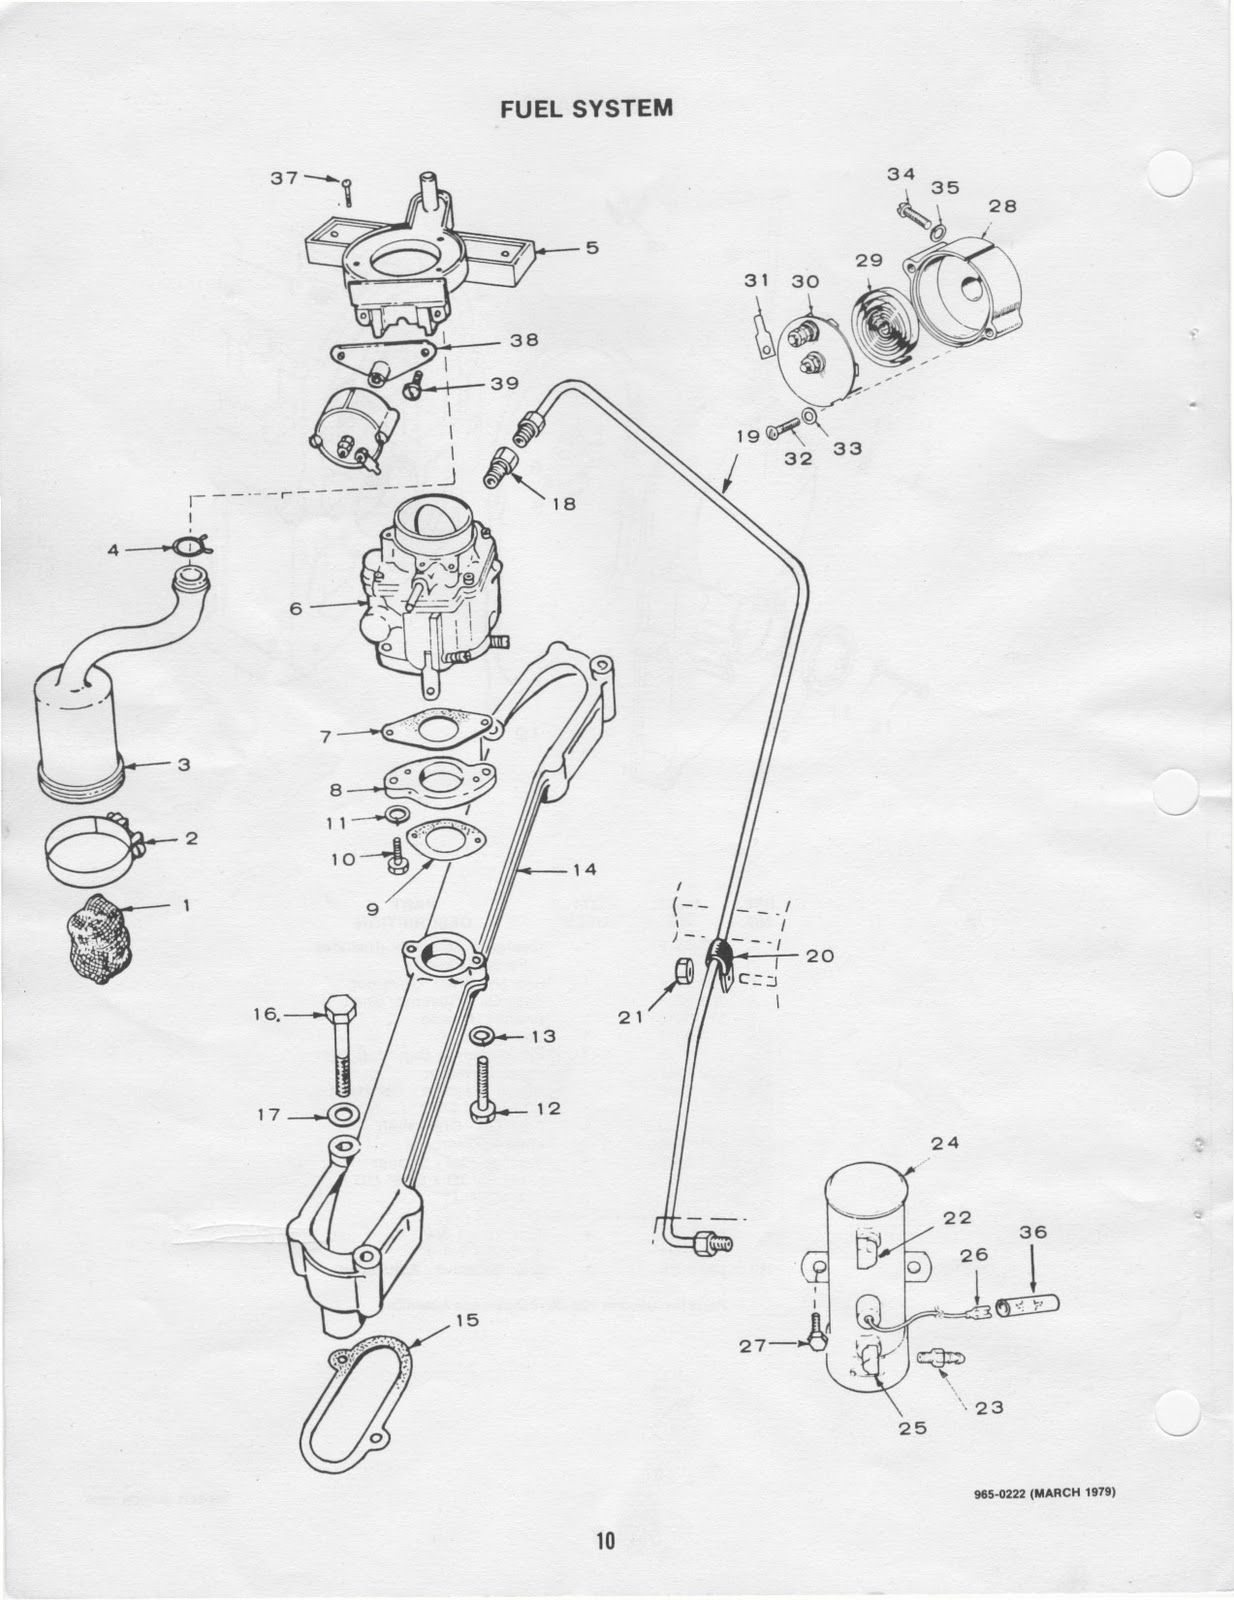 6 5 kw onan wiring diagram onan control board operation onankohler rv generator wiring diagram kohler [ 1234 x 1600 Pixel ]